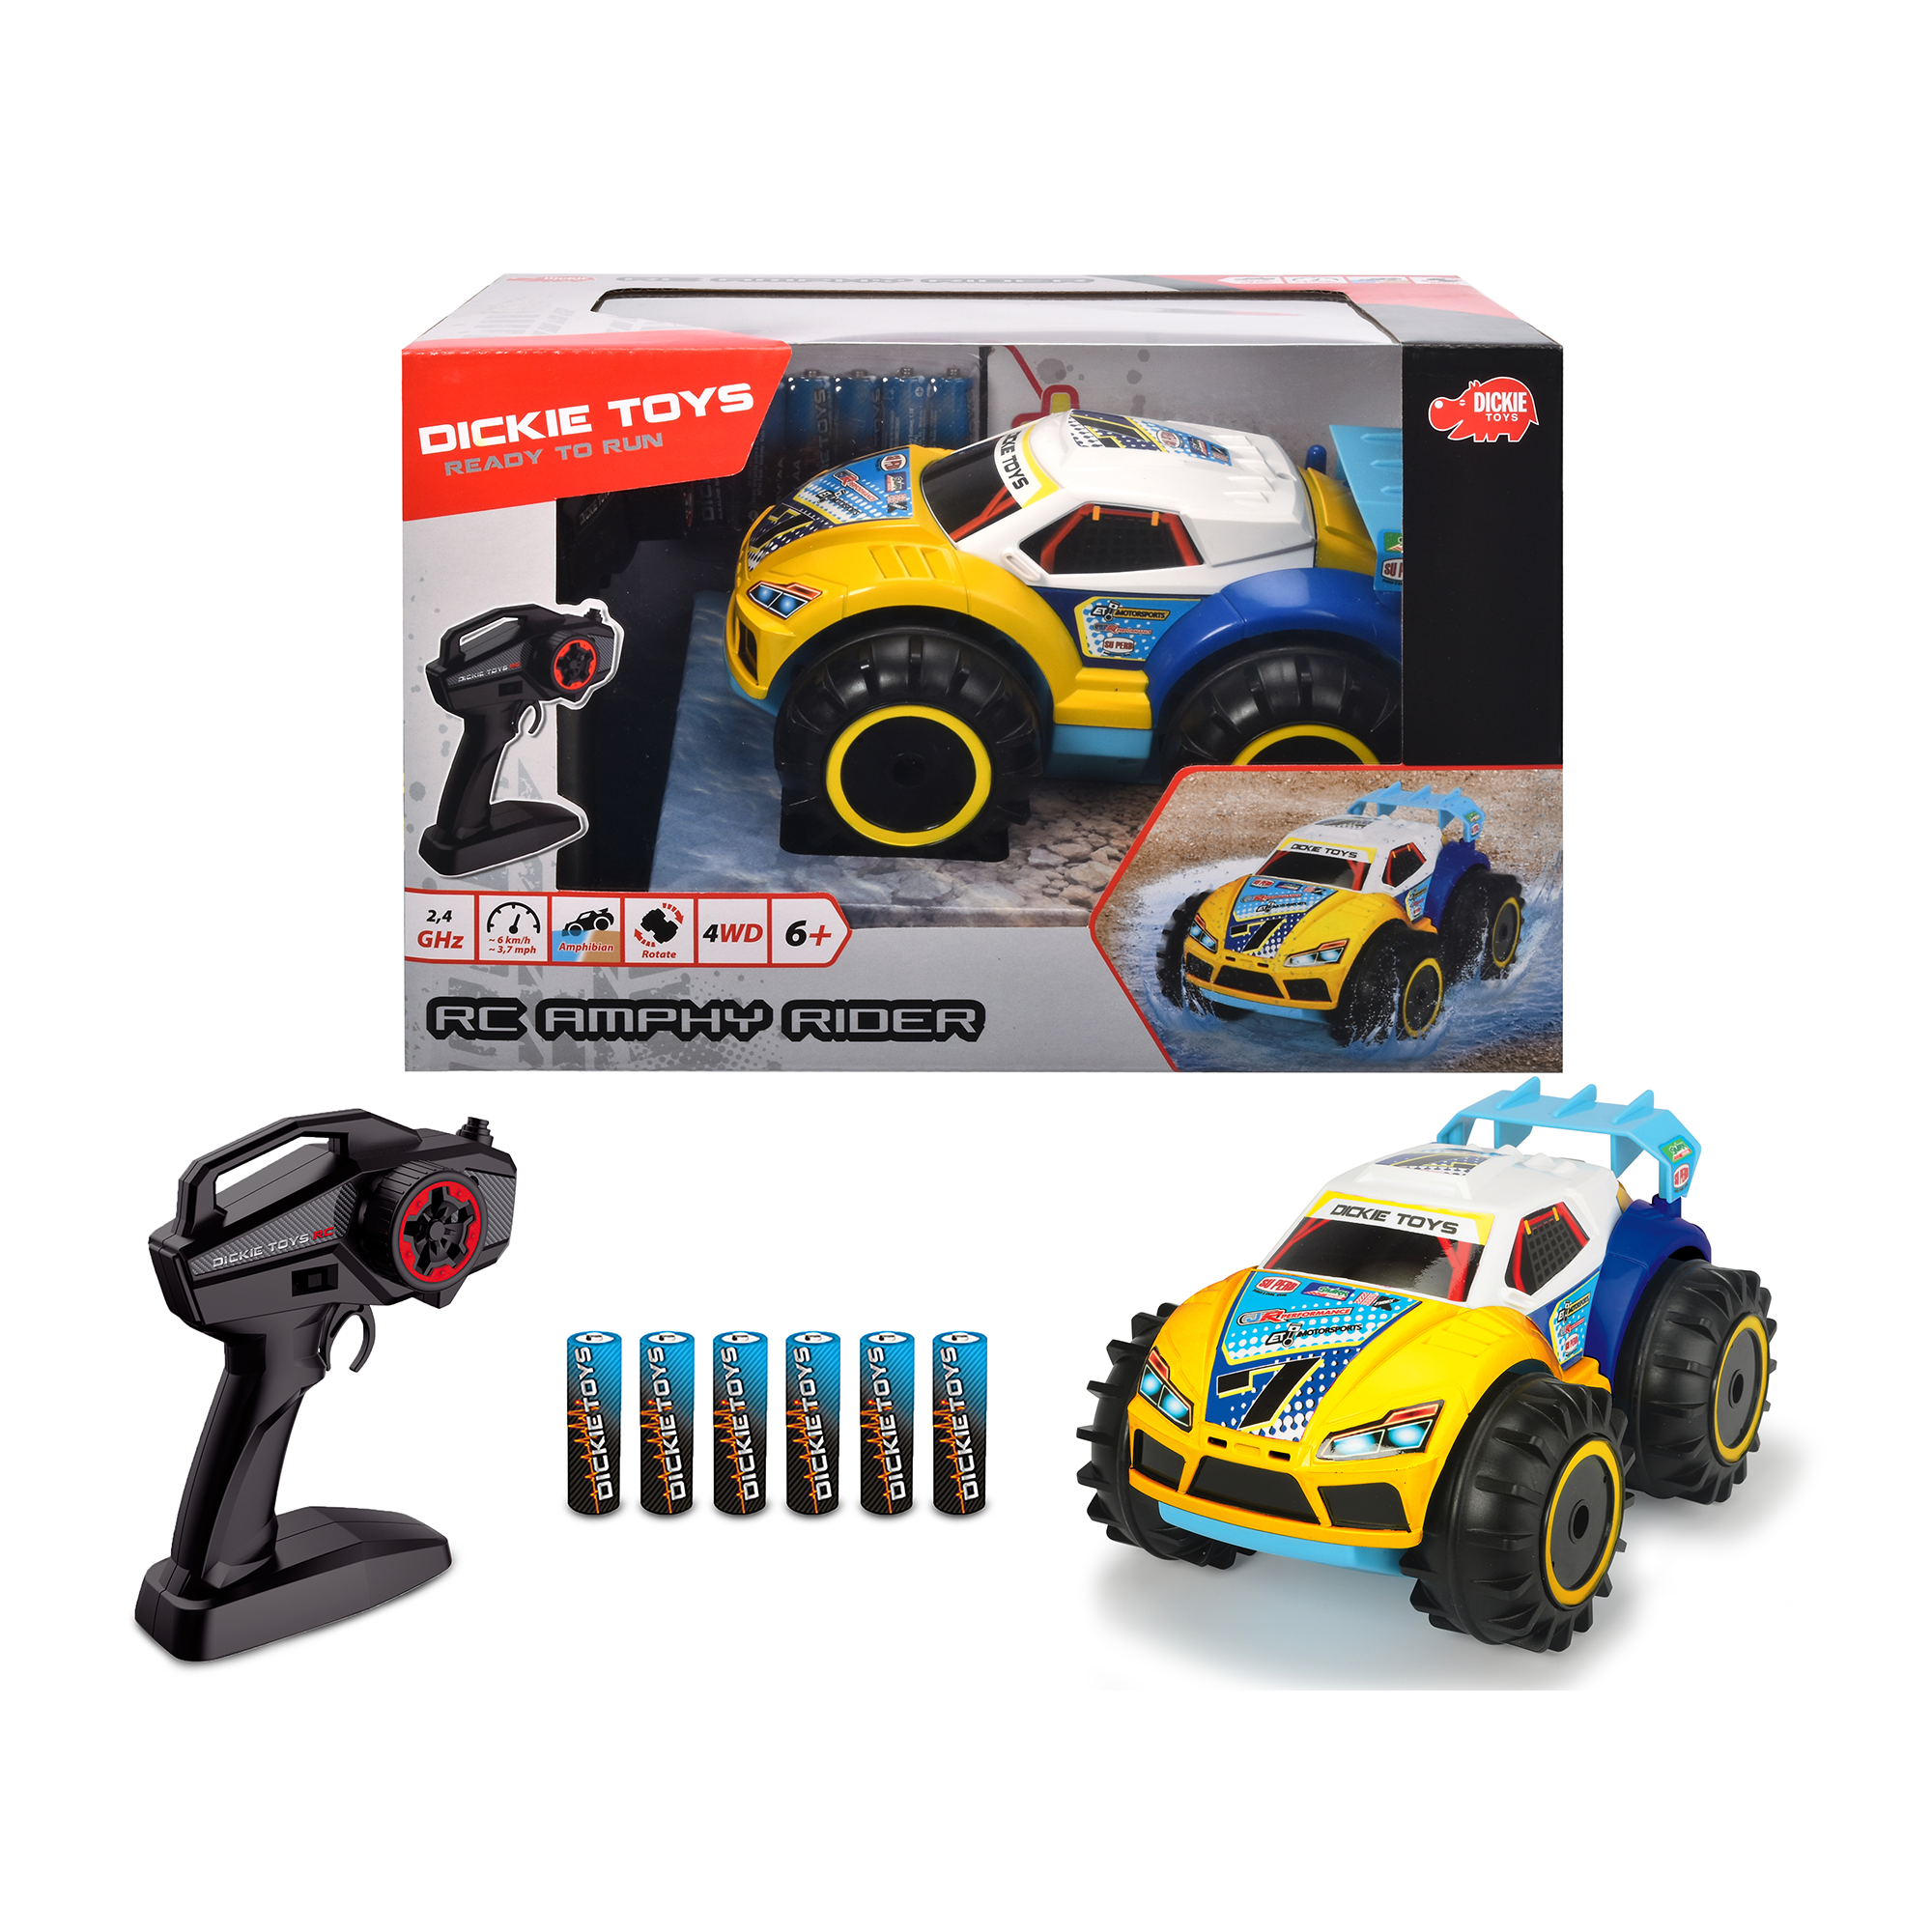 Auto r/c amphy rider - MOTOR&CO